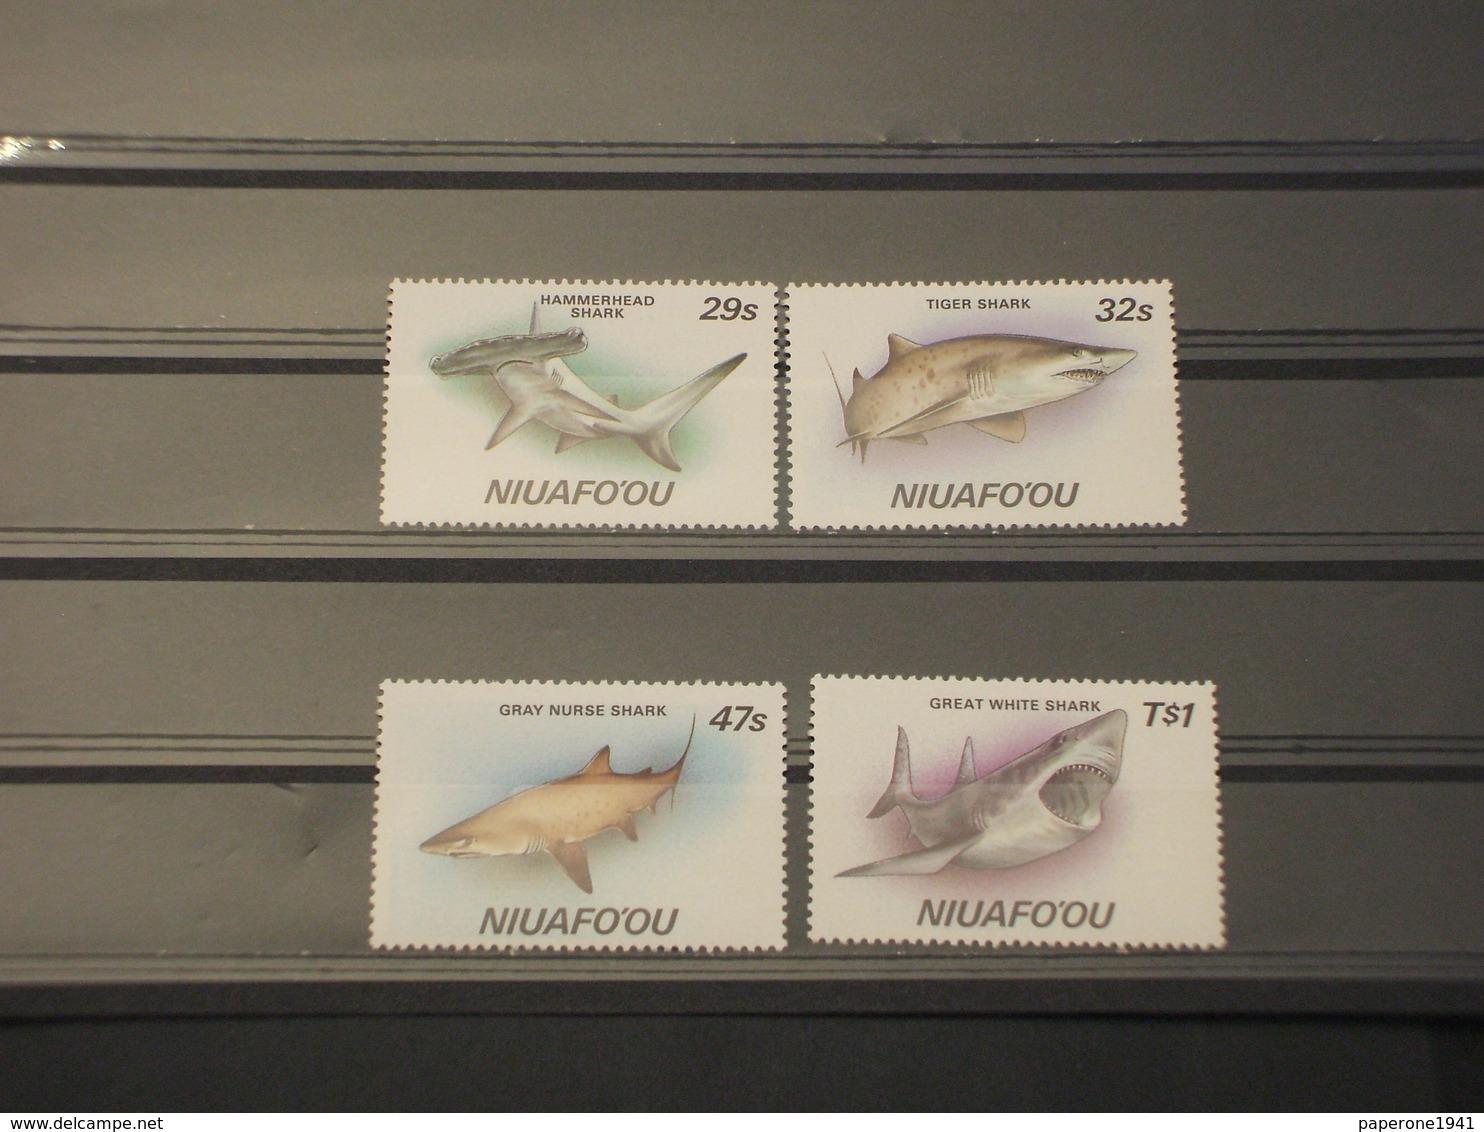 TONGA/NIUAFOOU - 1987 SQUALI 4 VALORI - NUOVI(++) - Tonga (1970-...)